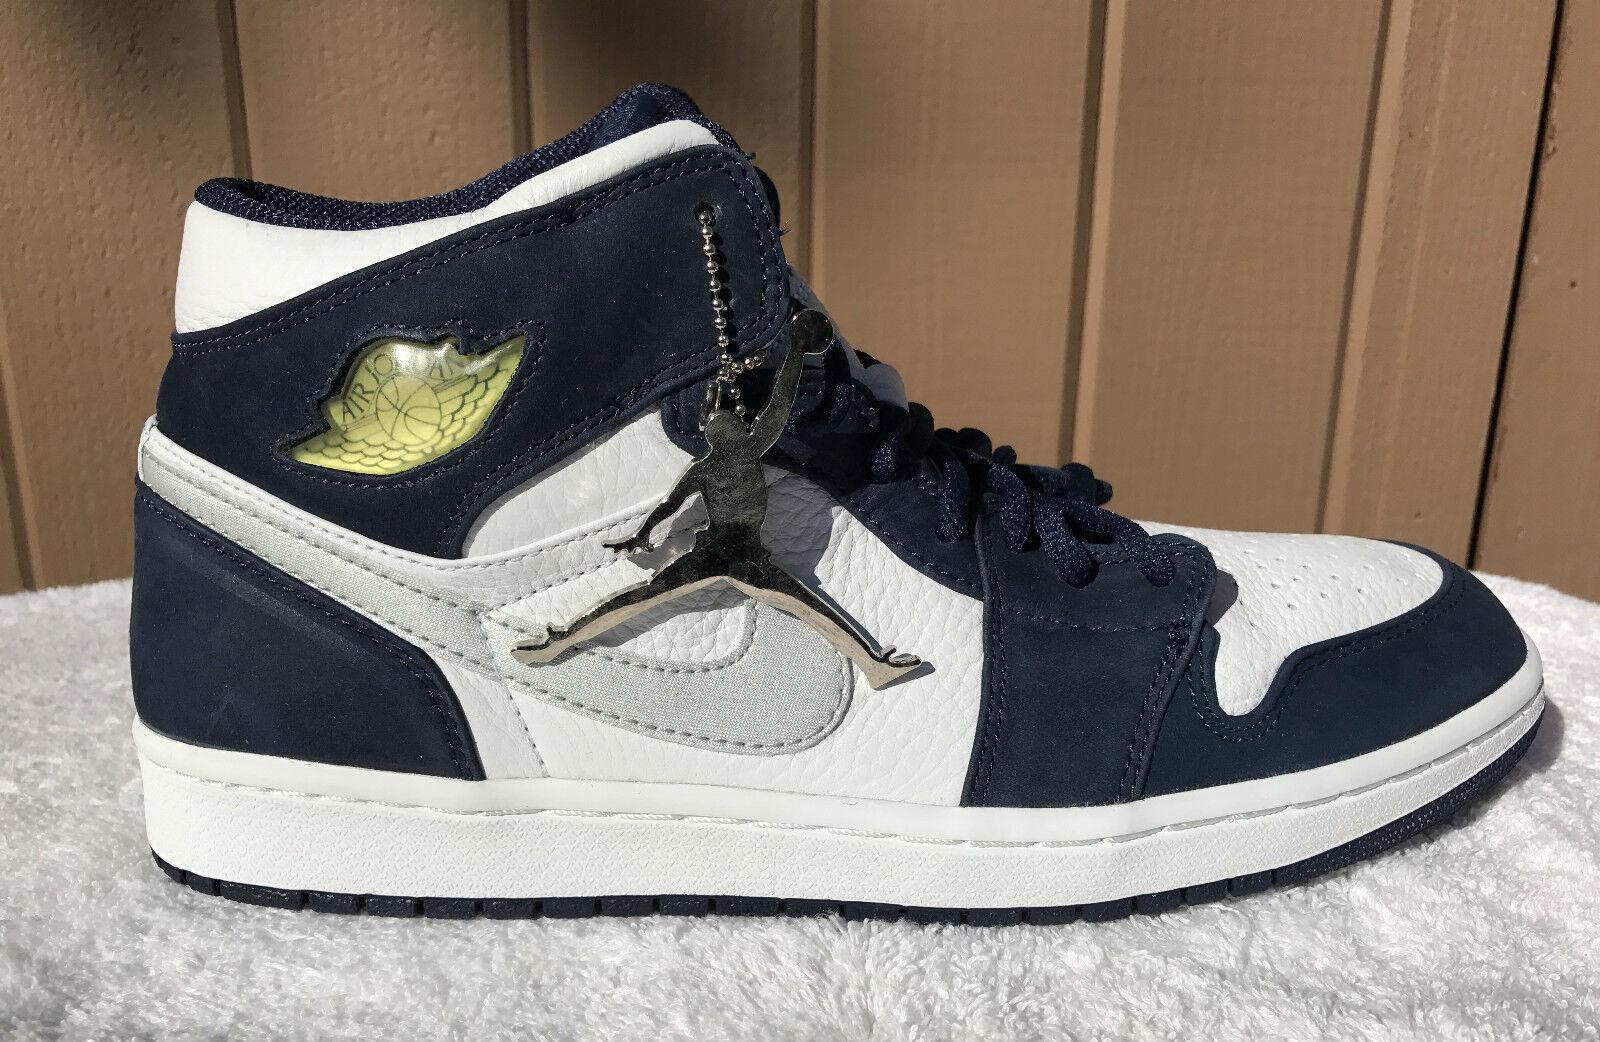 2001 Nike Air Jordan Retro 1 + White Silver Navy 10.5 Deadstock 136065-101